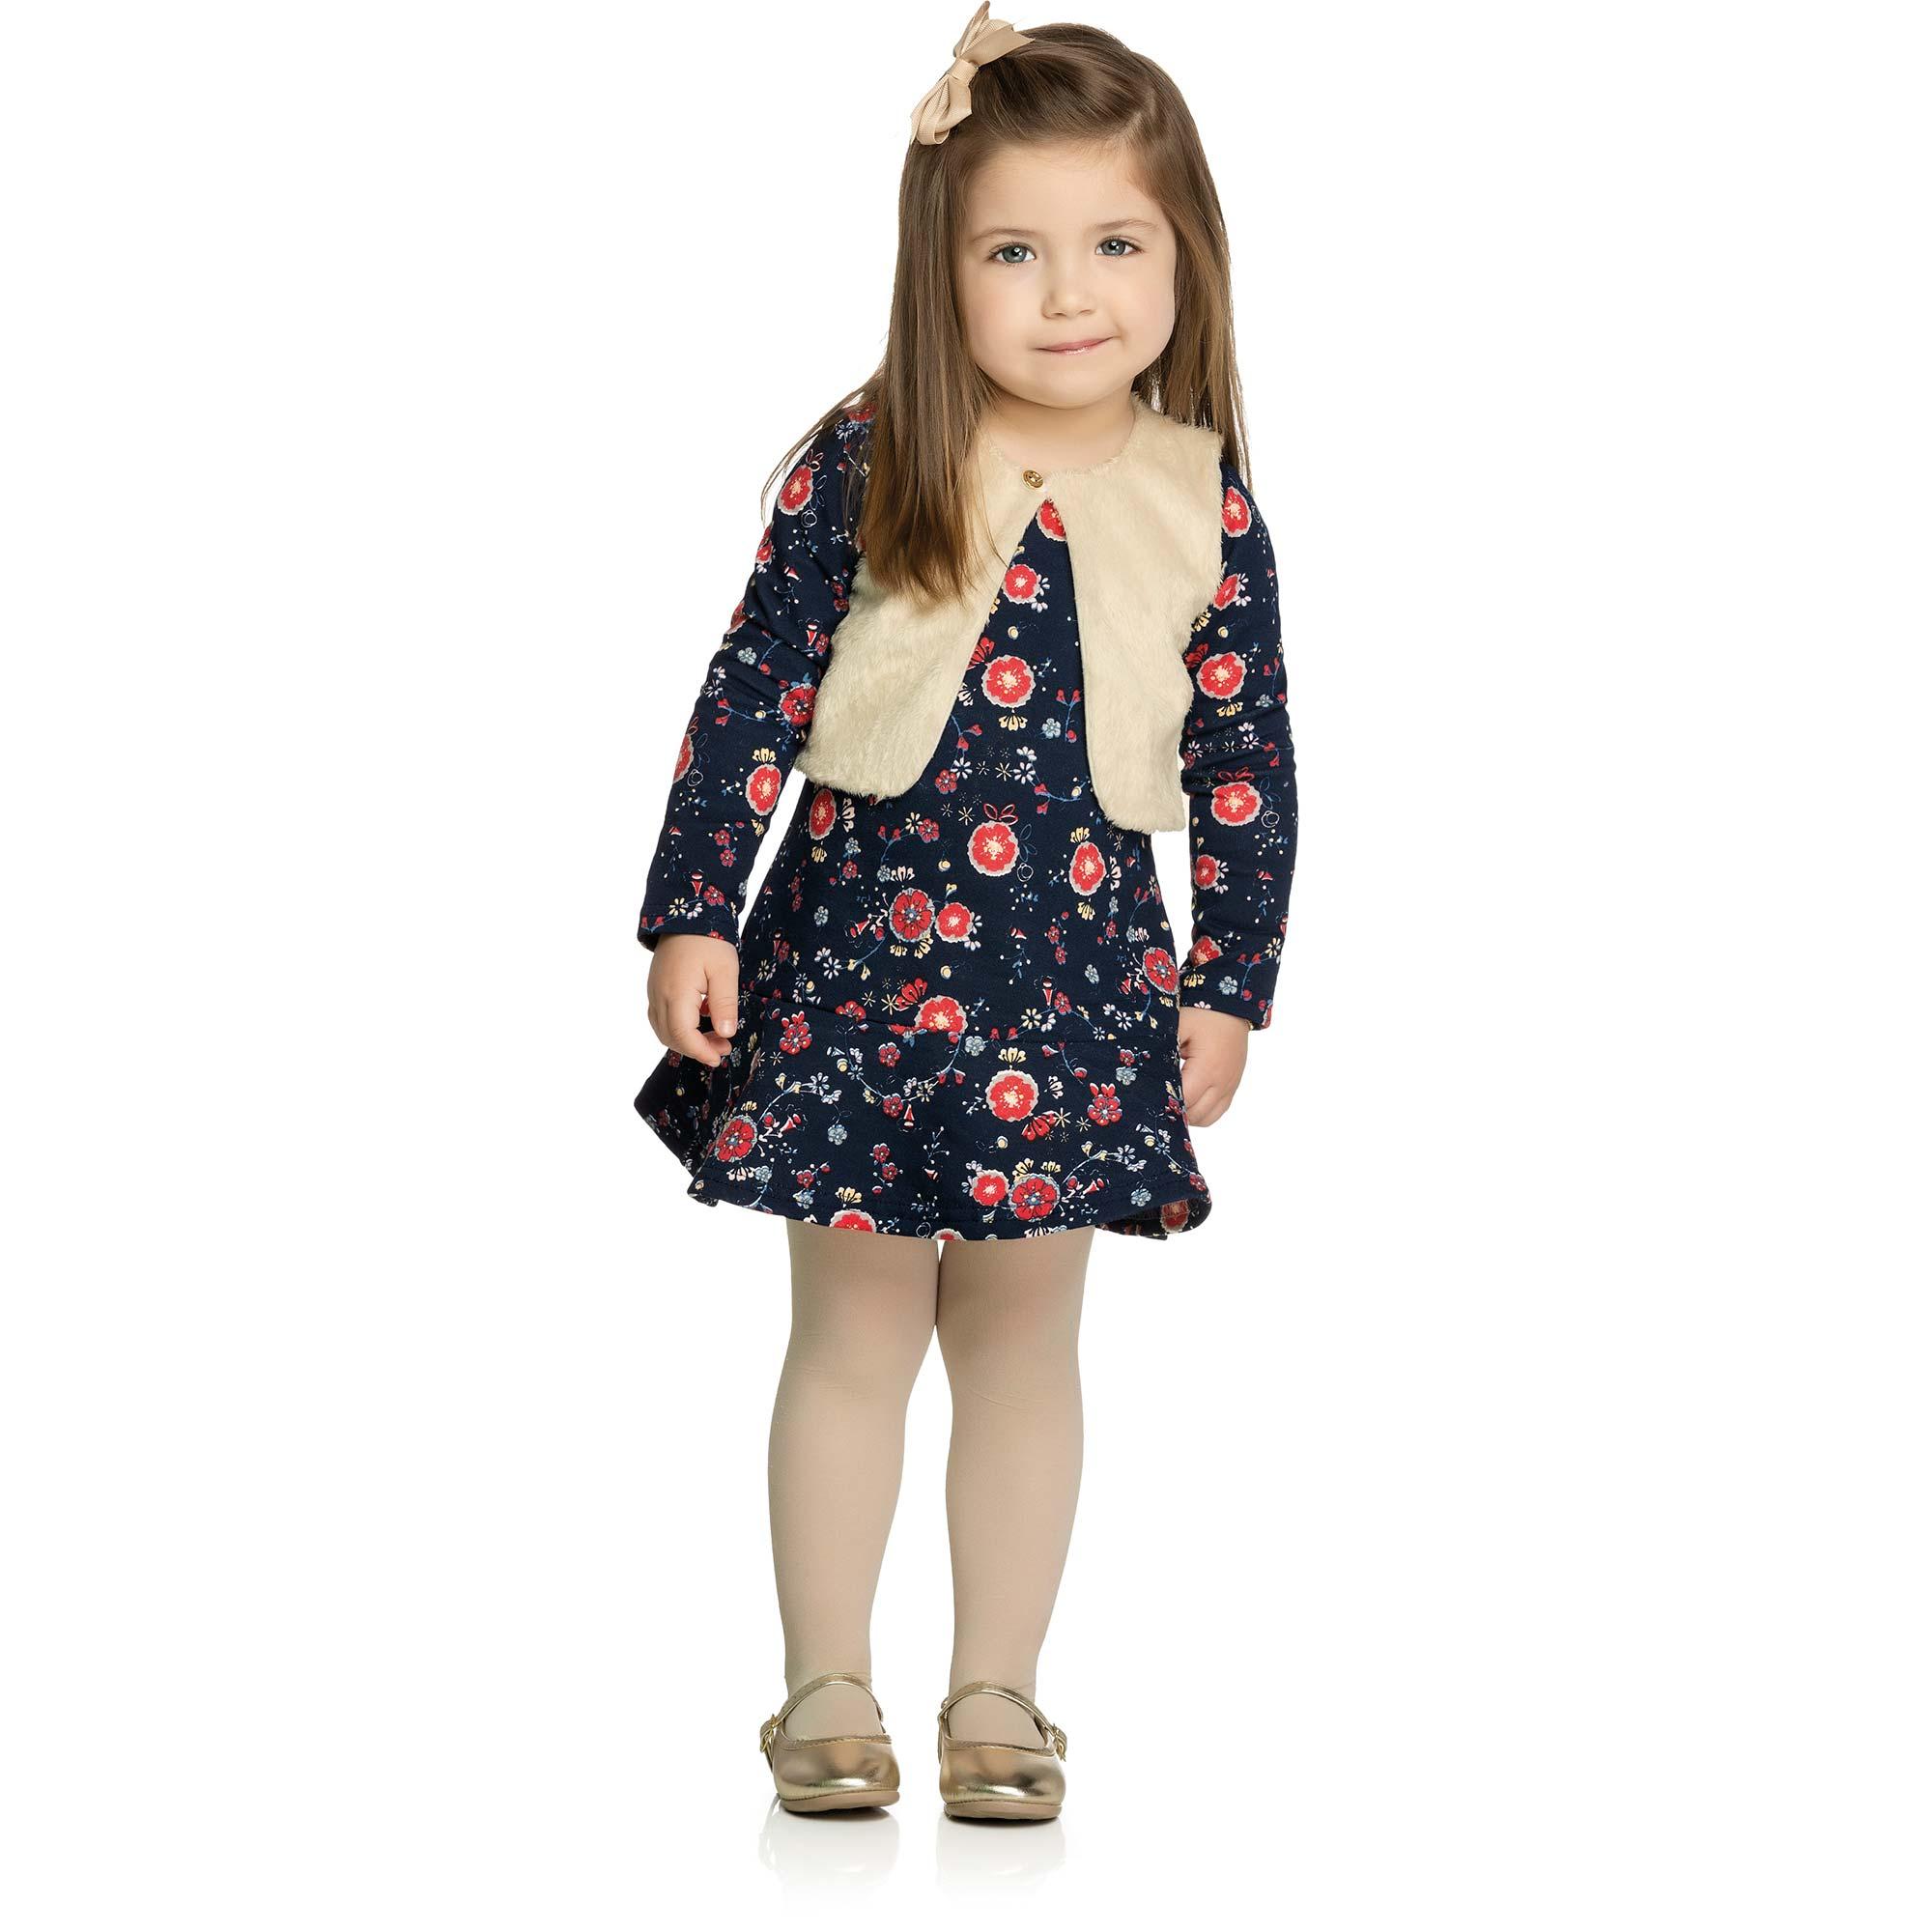 Conjunto Vestido Infantil Elian - Ref 231172 - Marinho